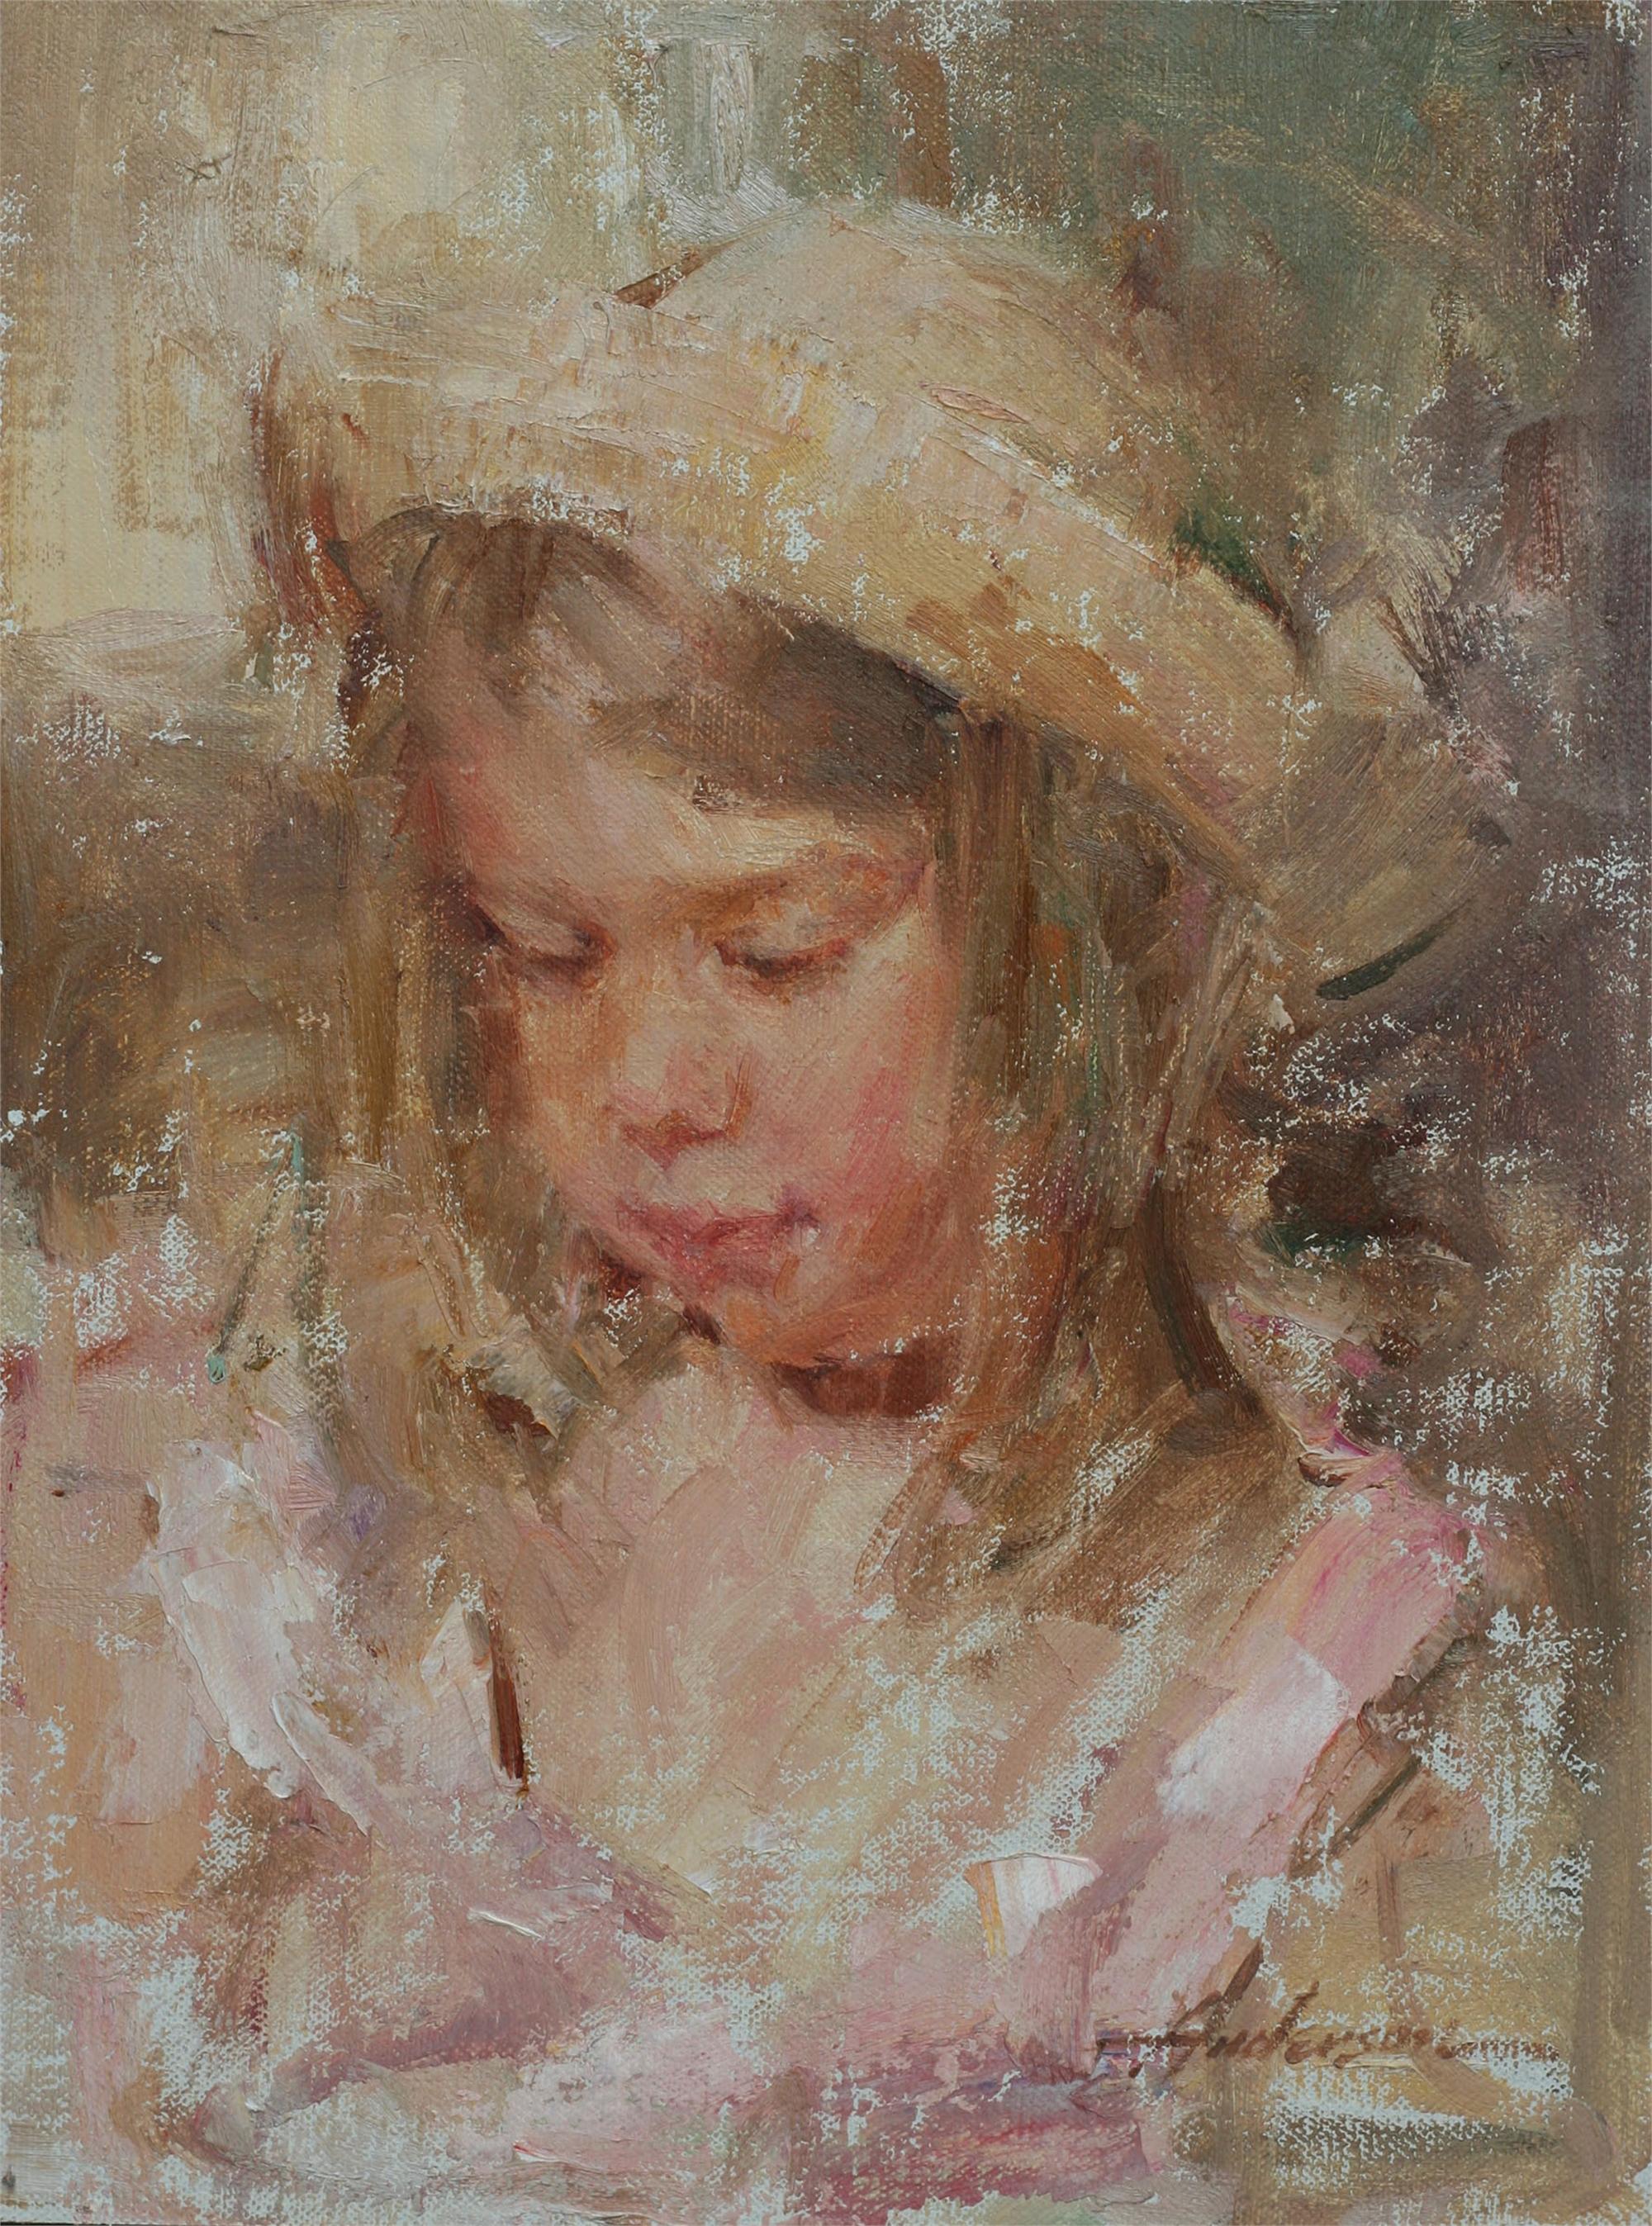 Girl in Straw Hat by Carolyn Anderson